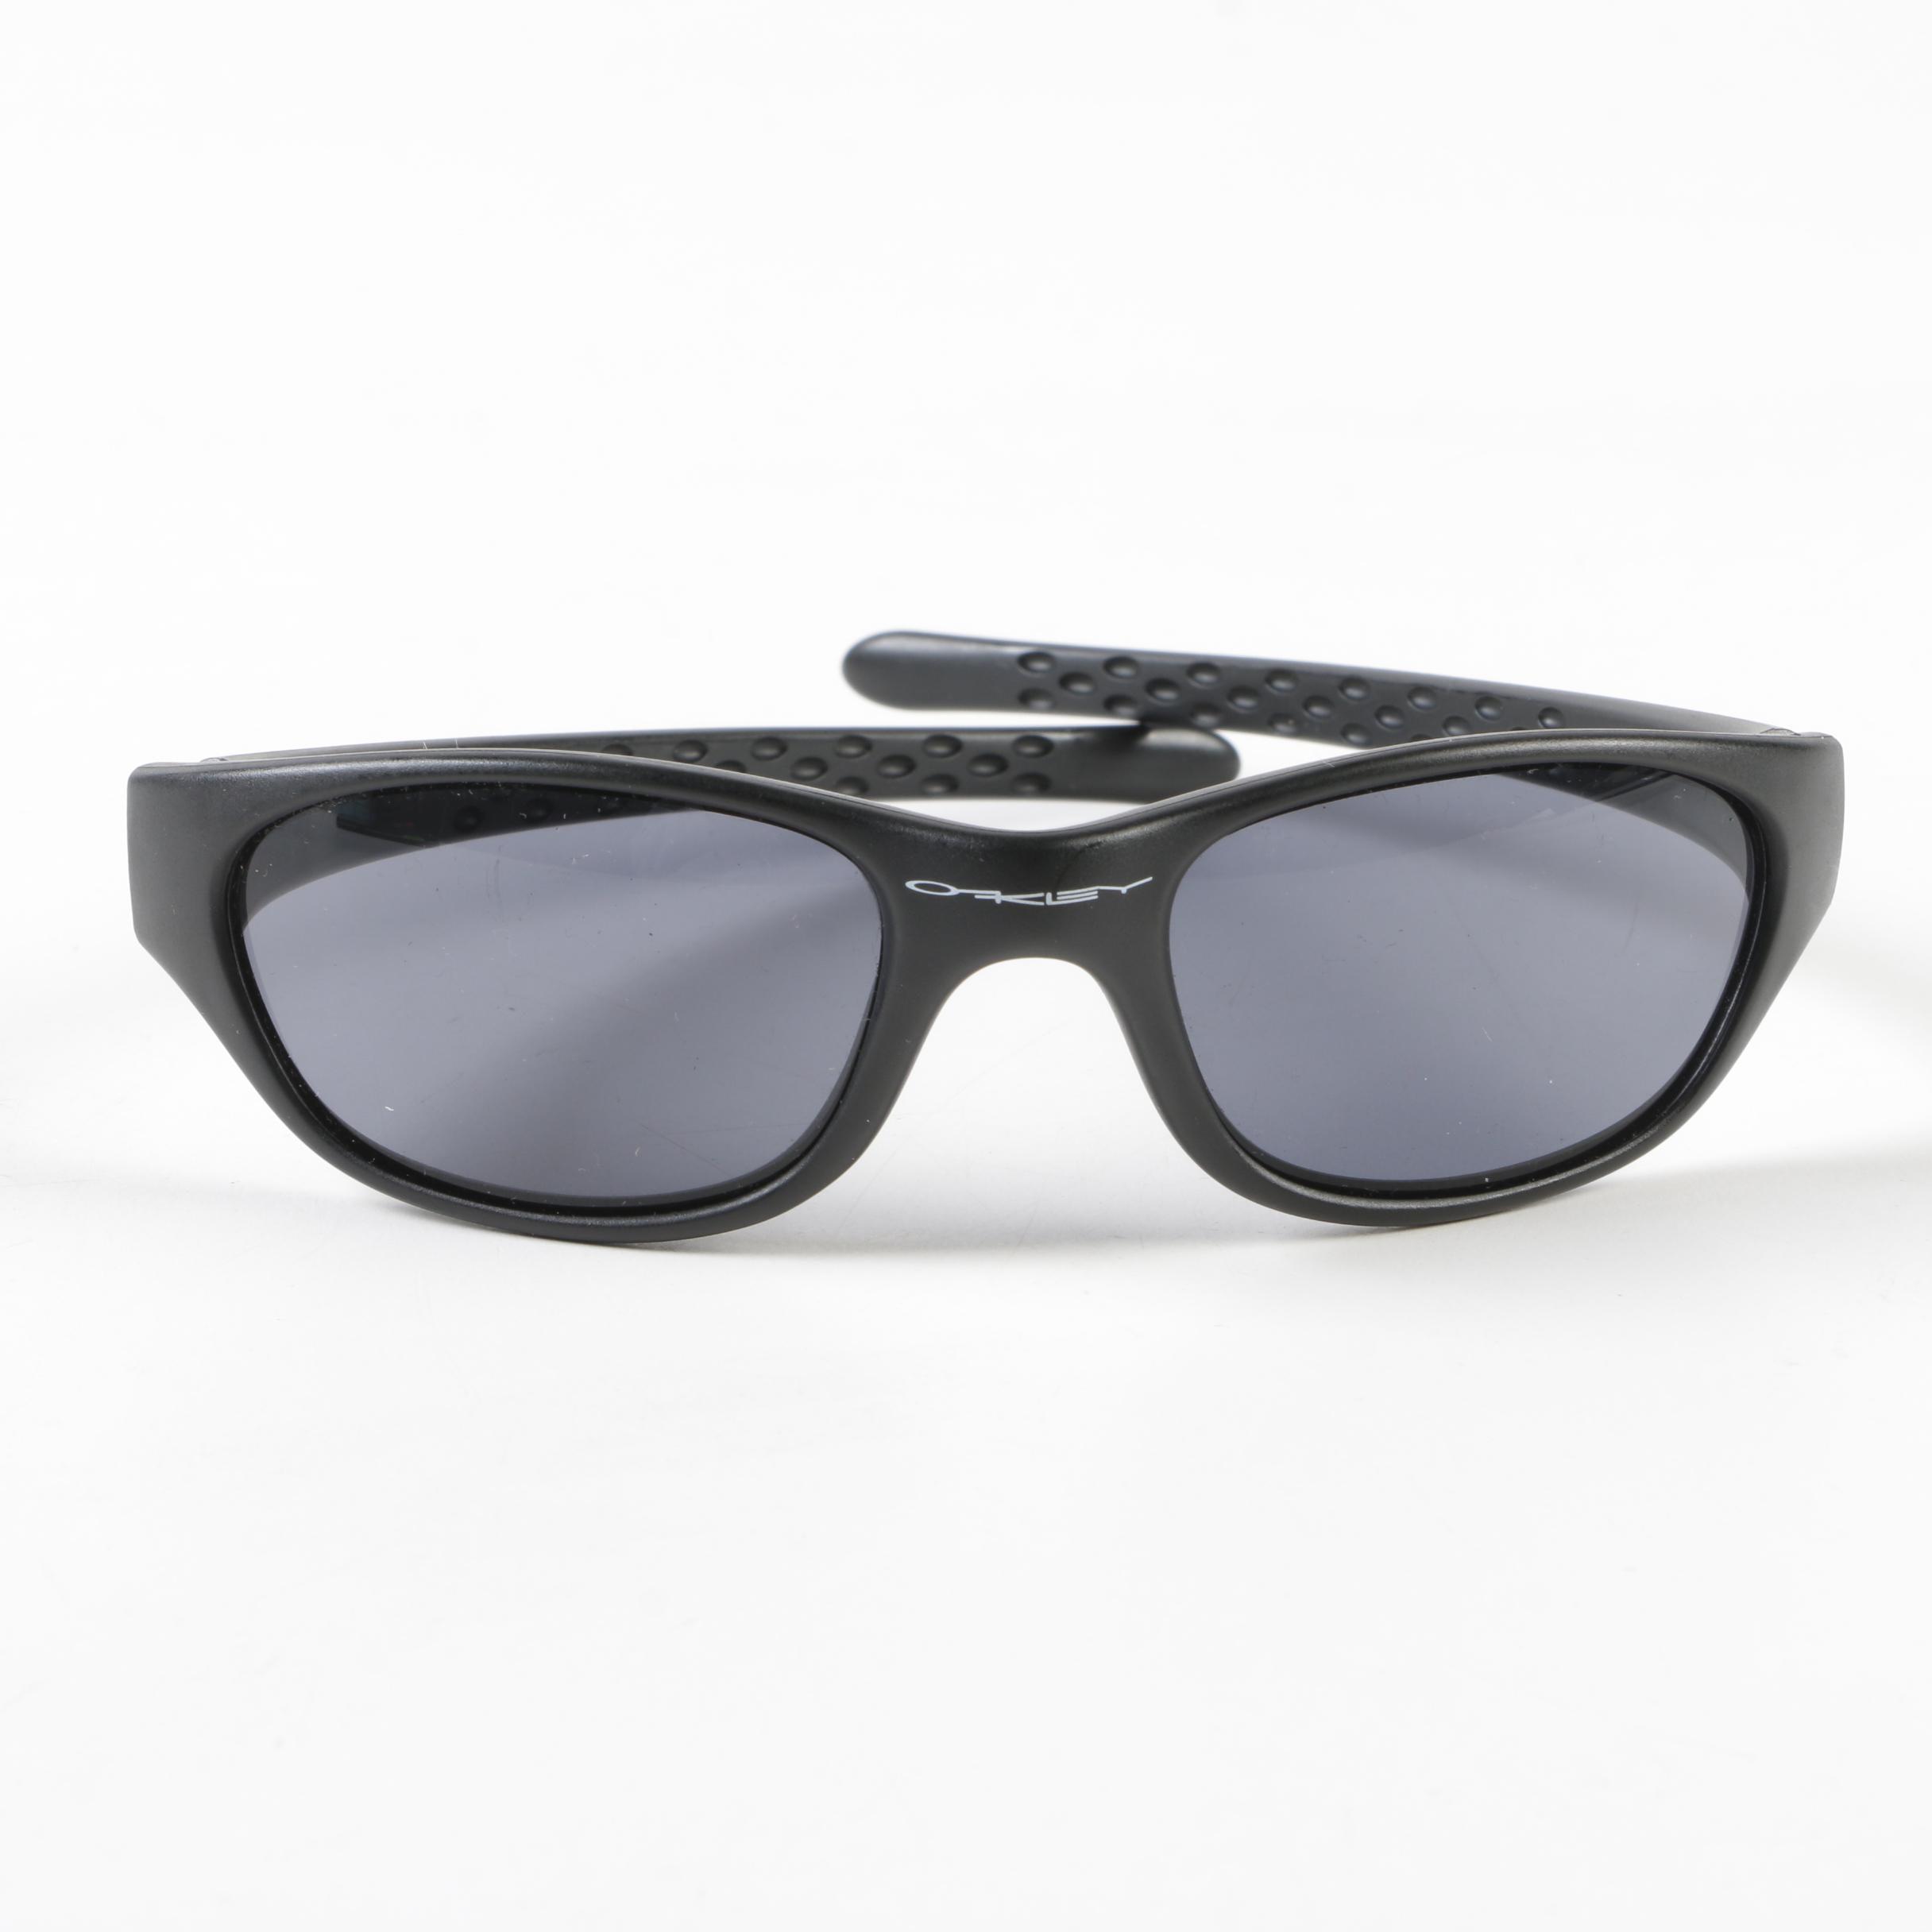 Oakley Black Sport Sunglasses with Case